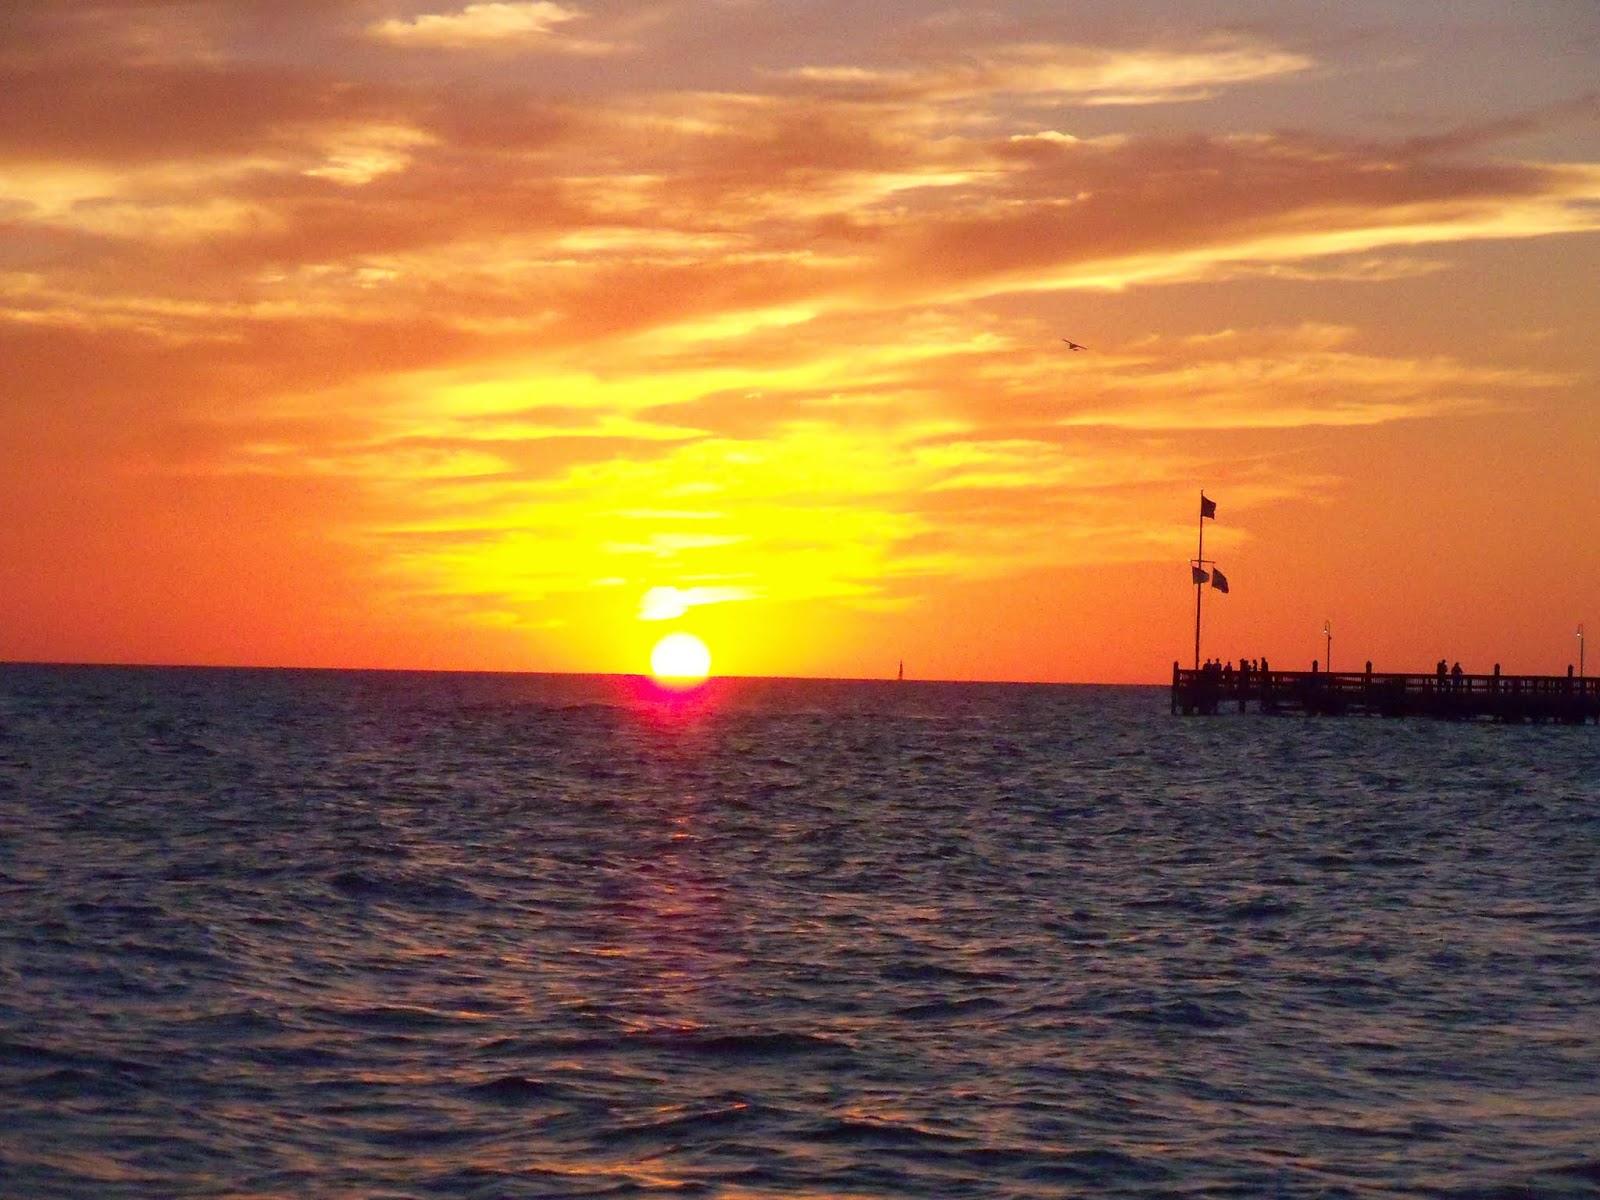 Key West Vacation - 116_5599.JPG